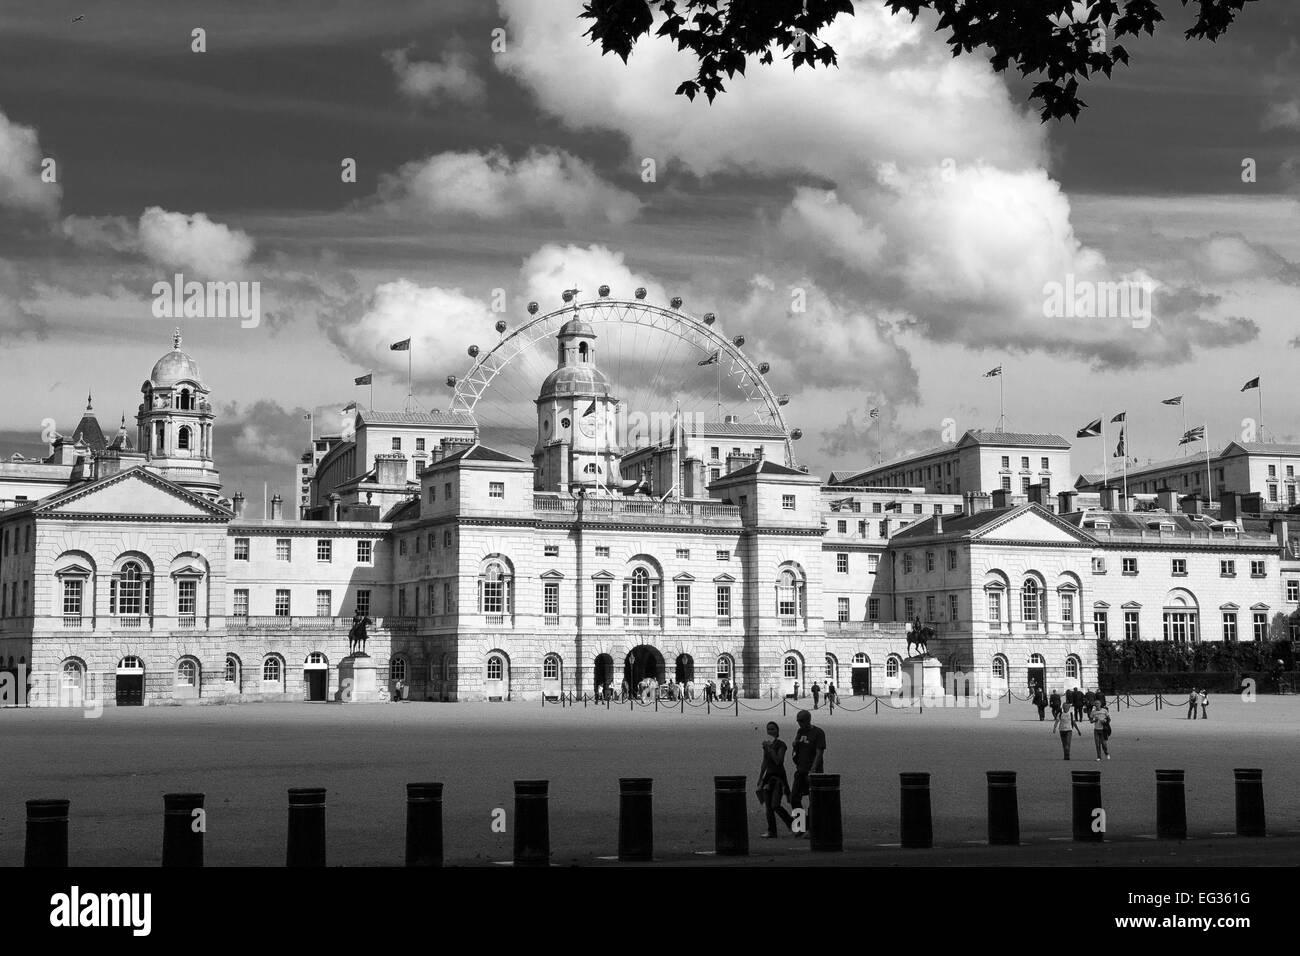 Horseguards Parade and London Eye London - Stock Image